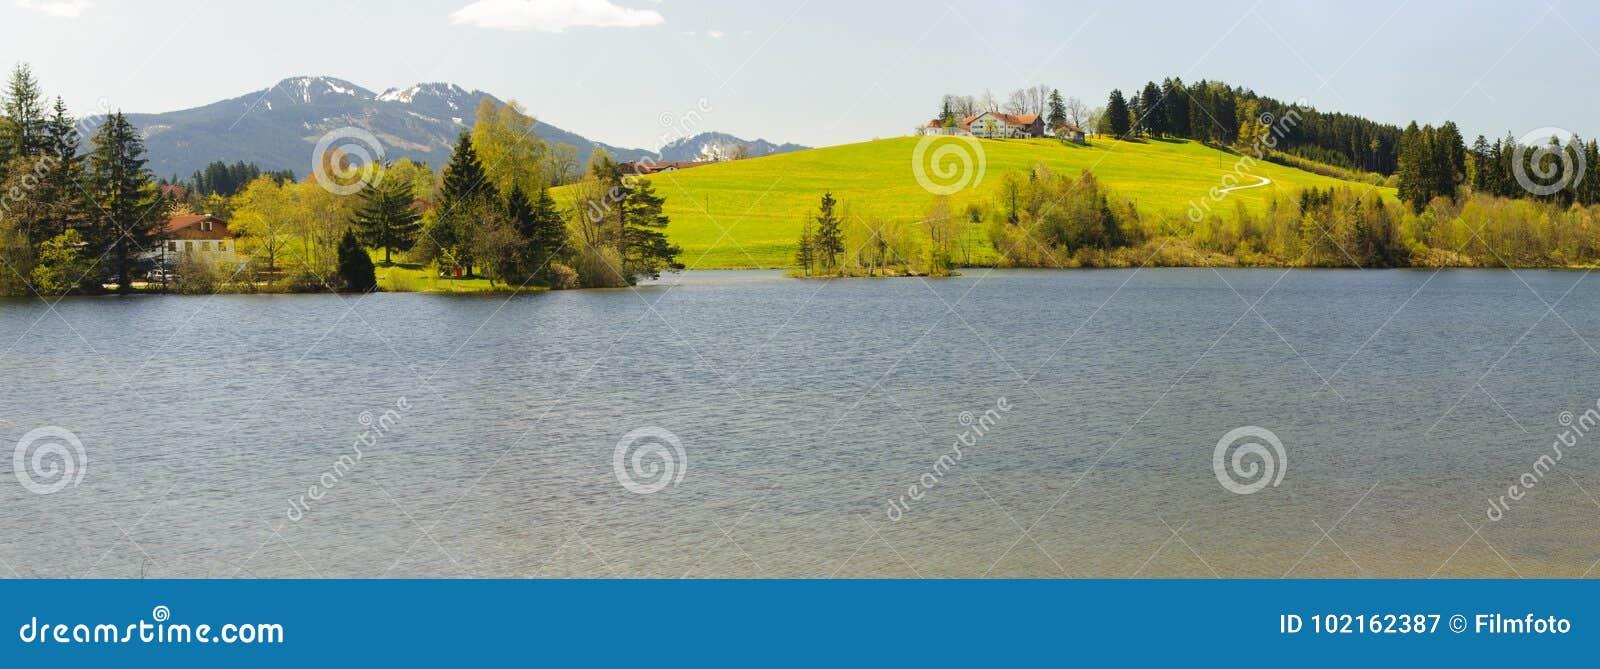 Ландшафт панорамы в Баварии с горами горных вершин